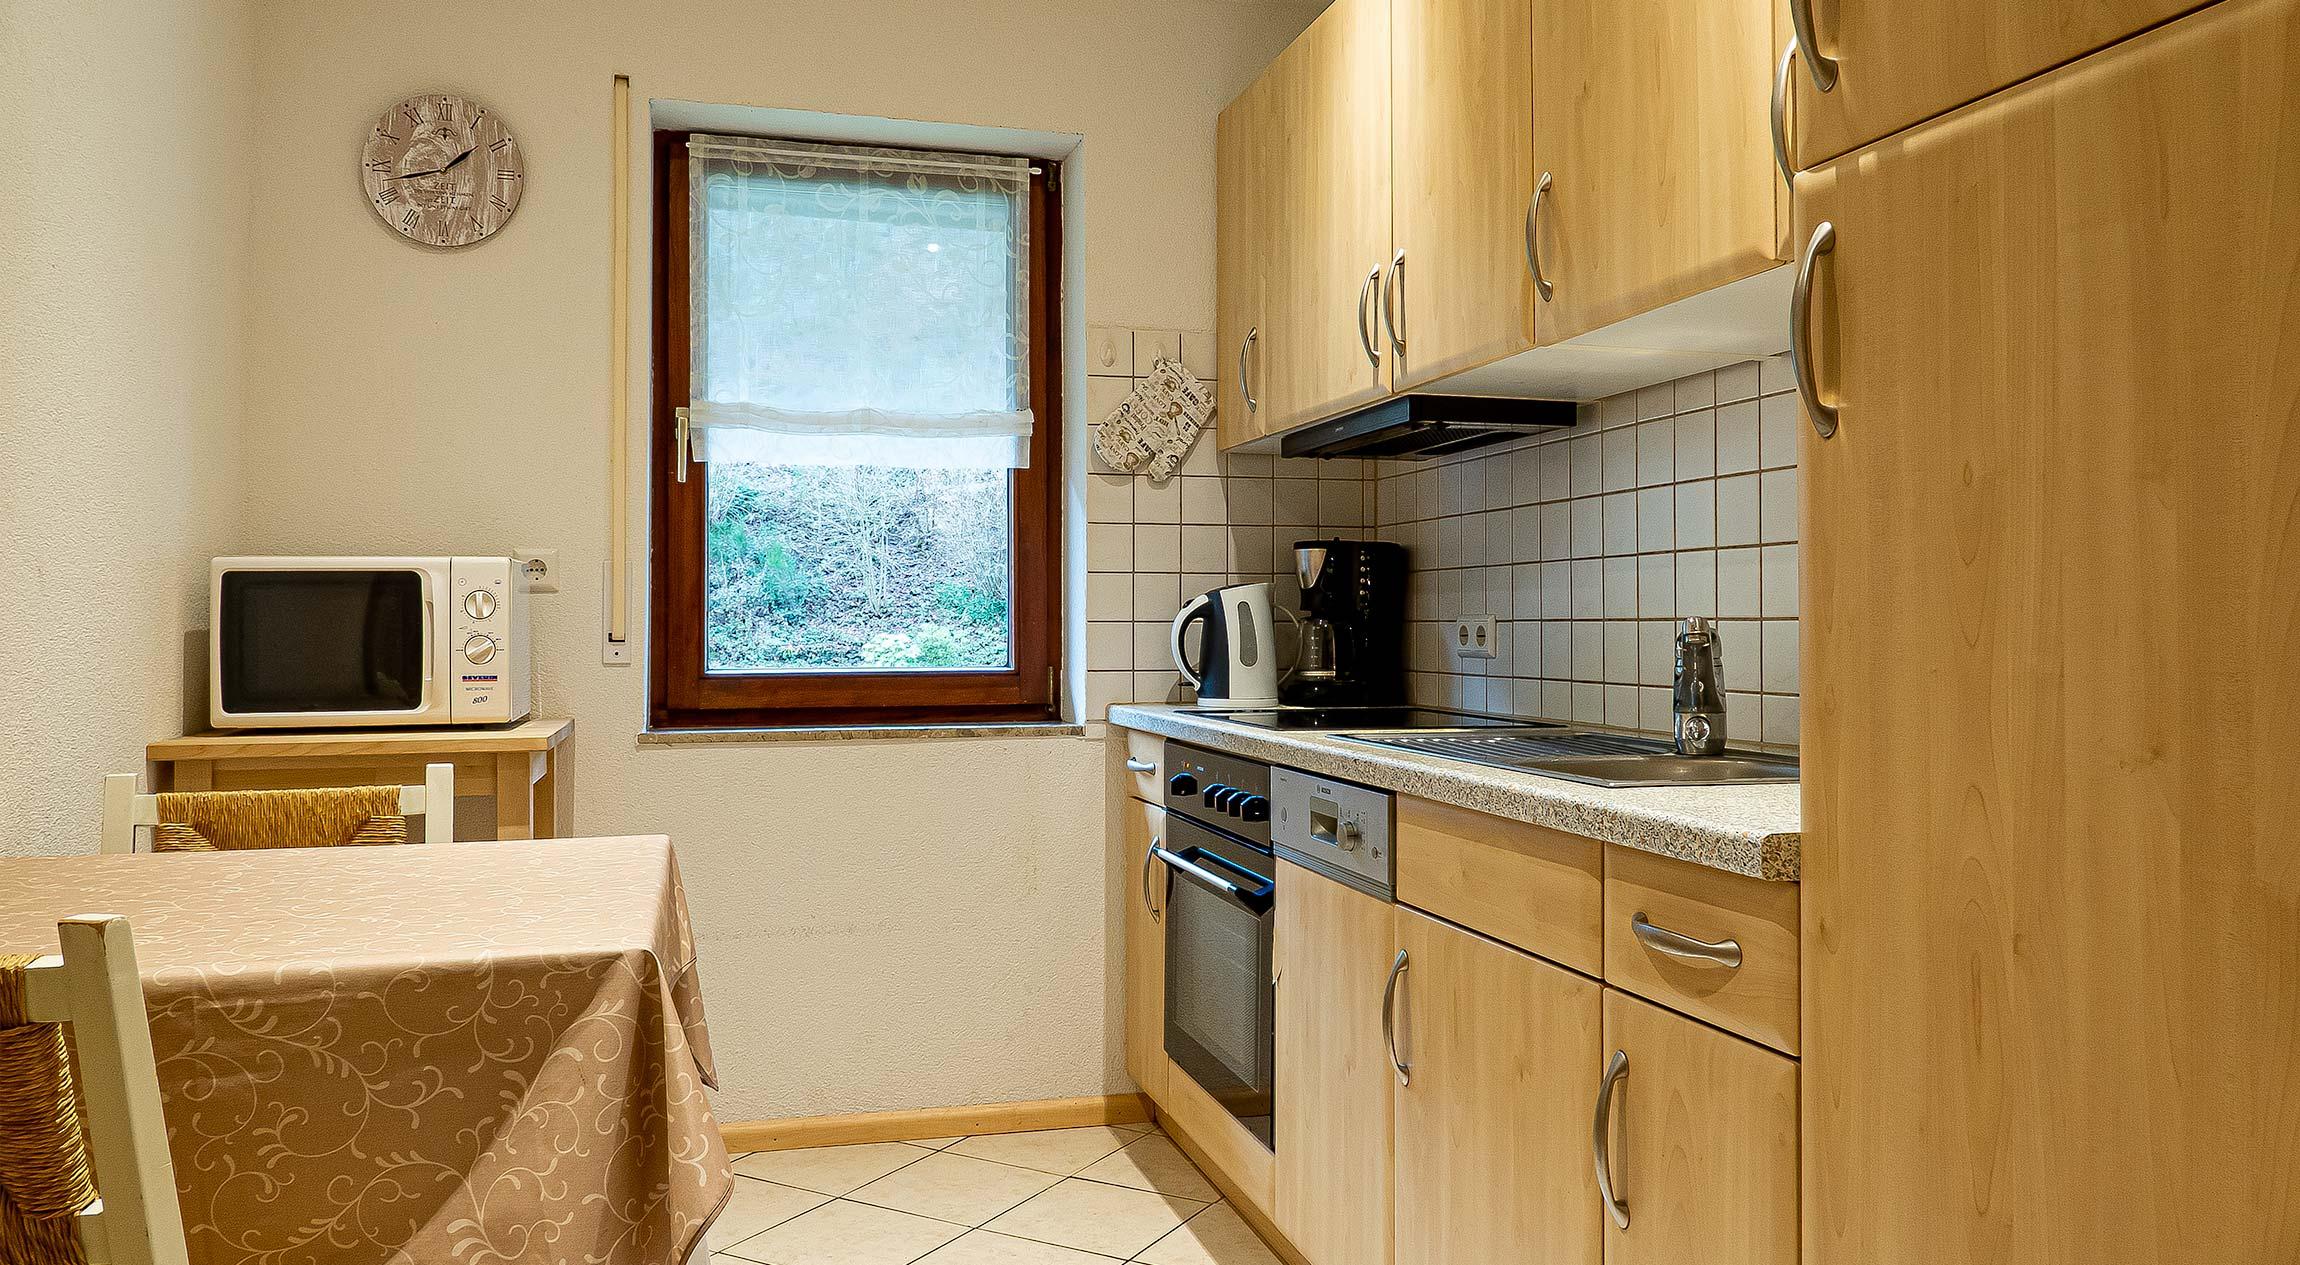 Leibgedinghaus - Küche